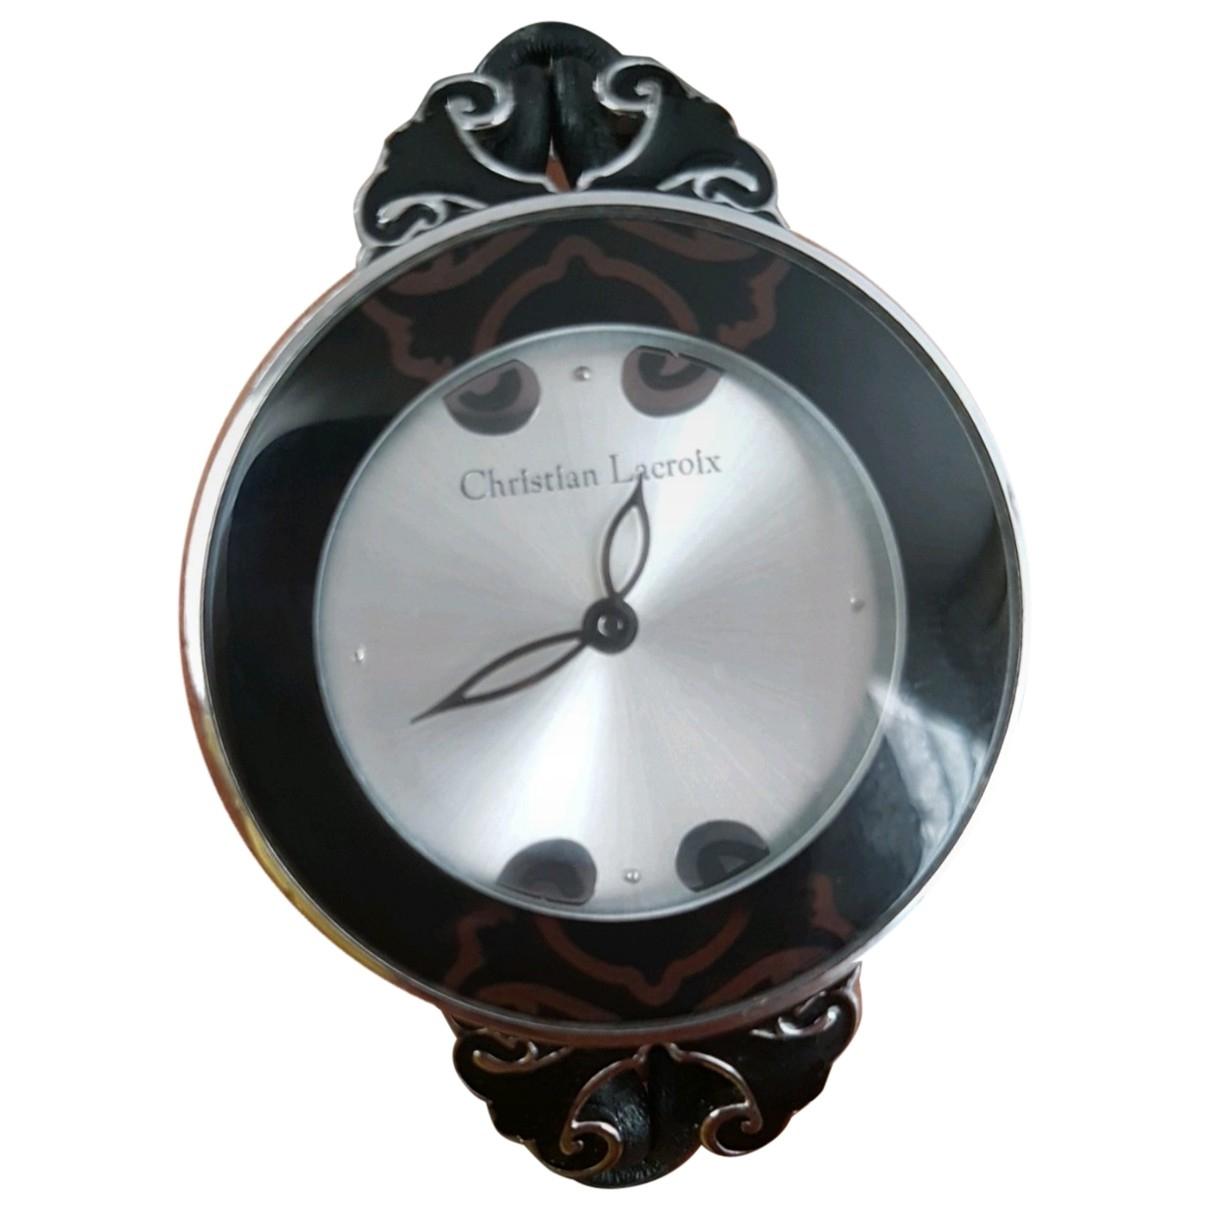 Christian Lacroix \N Uhr in  Schwarz Stahl